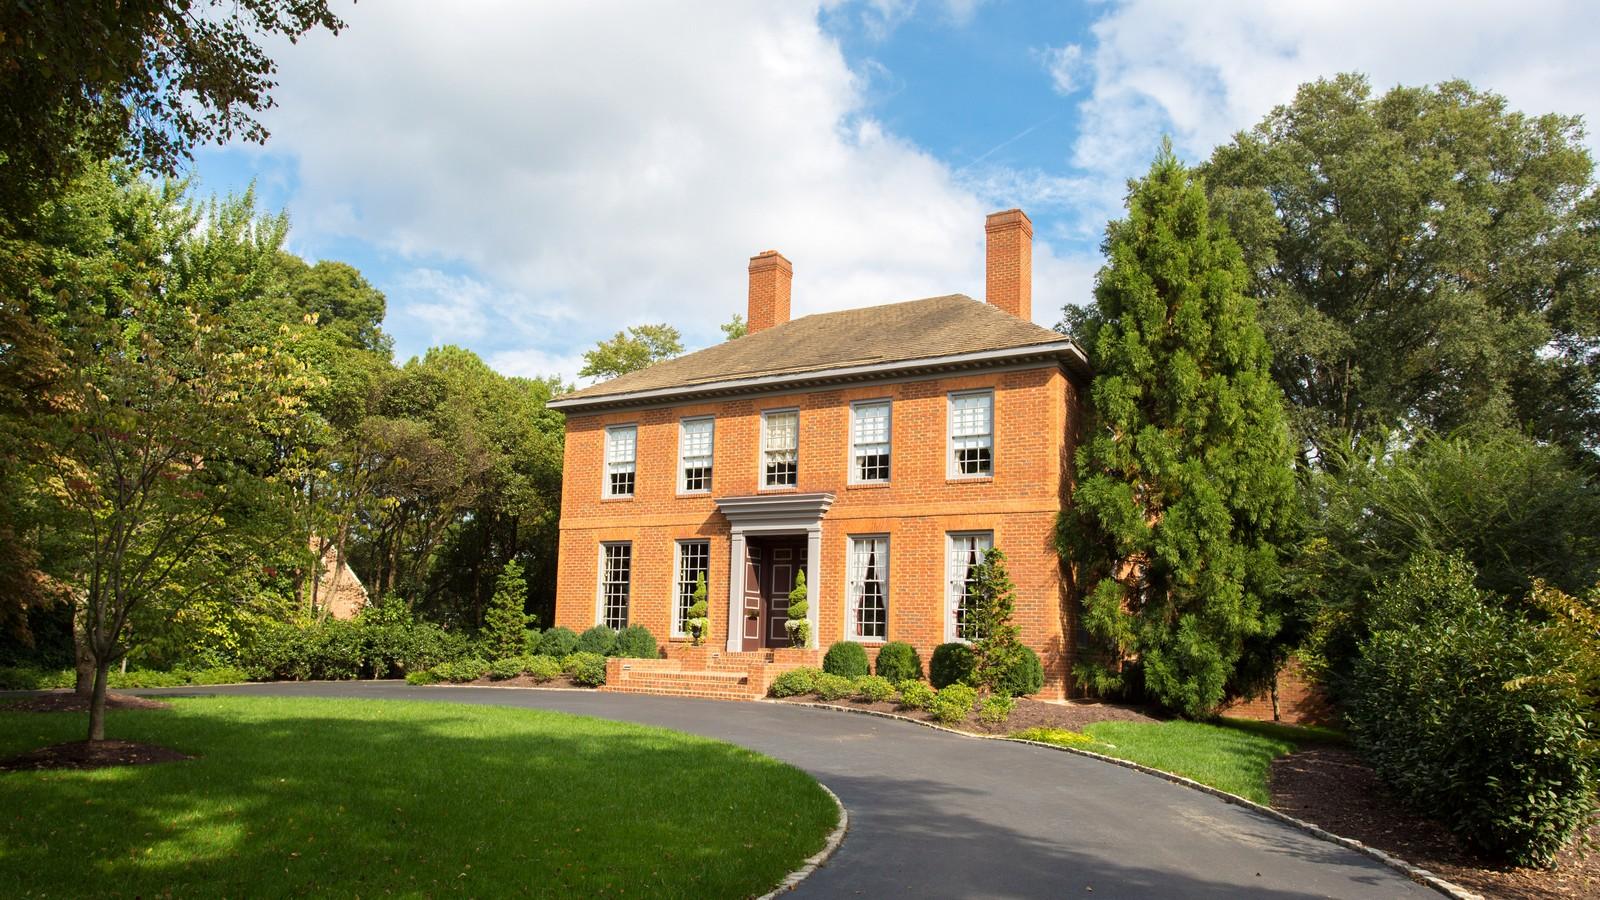 Villa per Vendita alle ore 209 Nottingham Road, Richmond 209 Nottingham Rd Richmond, Virginia 23221 Stati Uniti